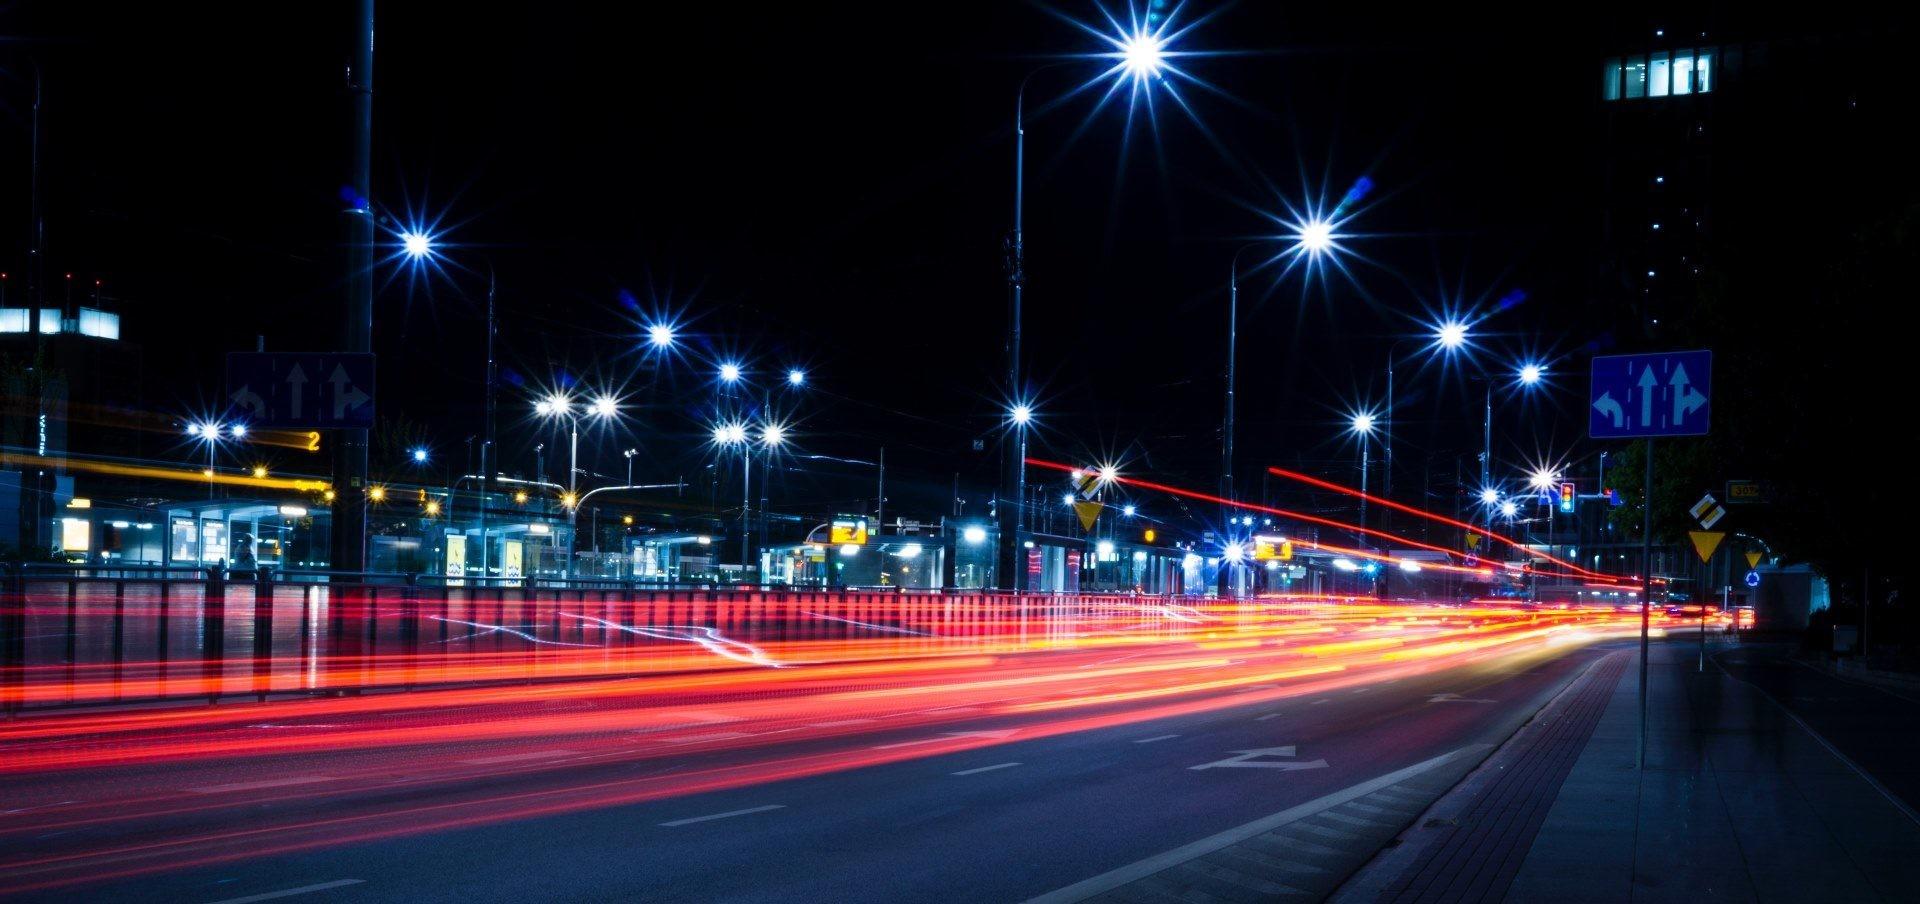 STREET LIGHTING in Doha Qatar